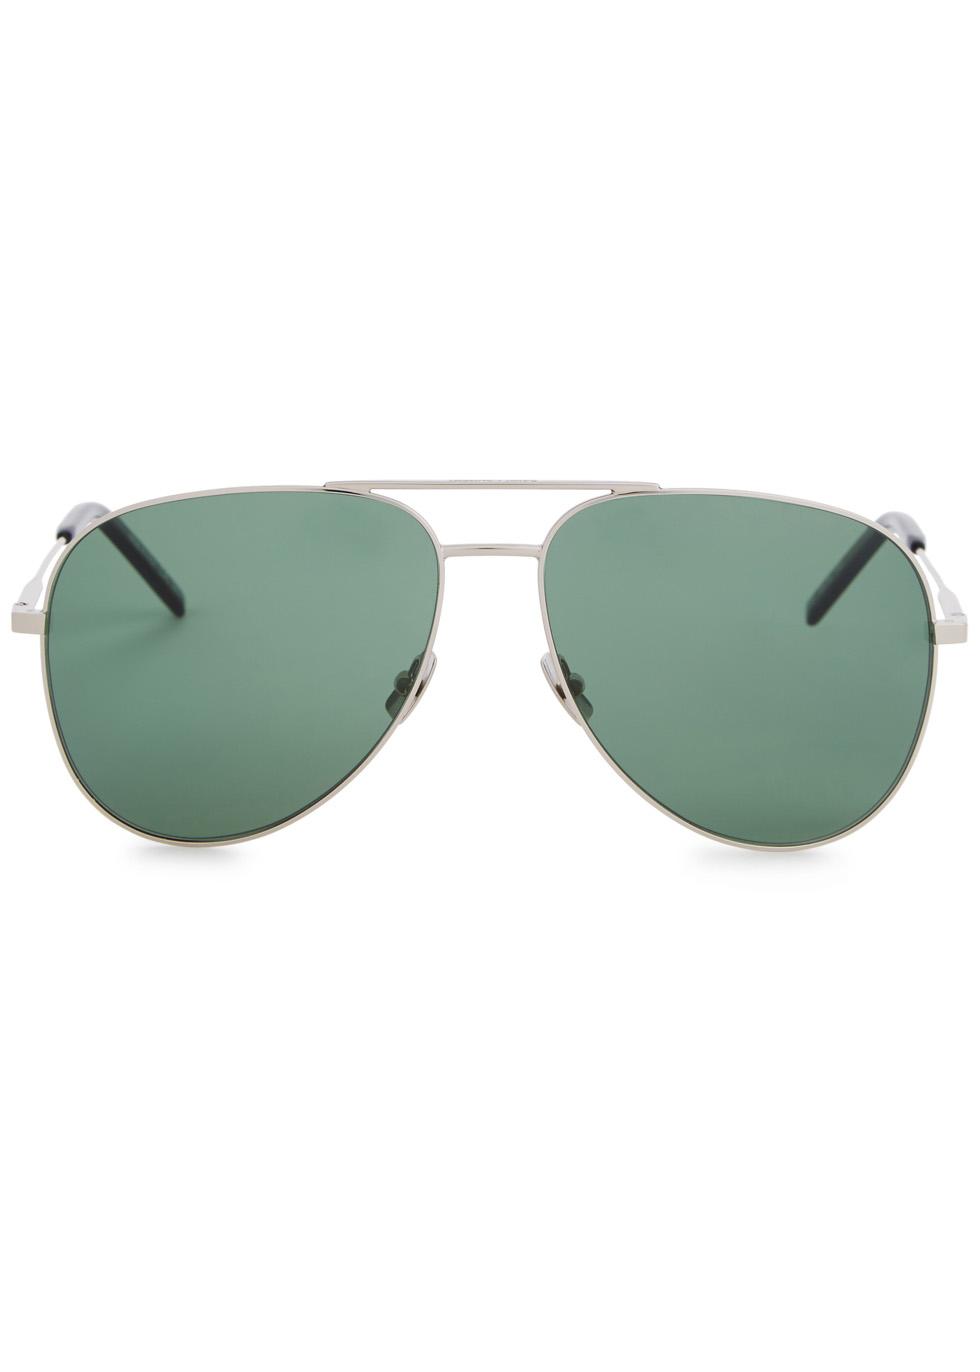 Classic 11 aviator-style sunglasses - Saint Laurent